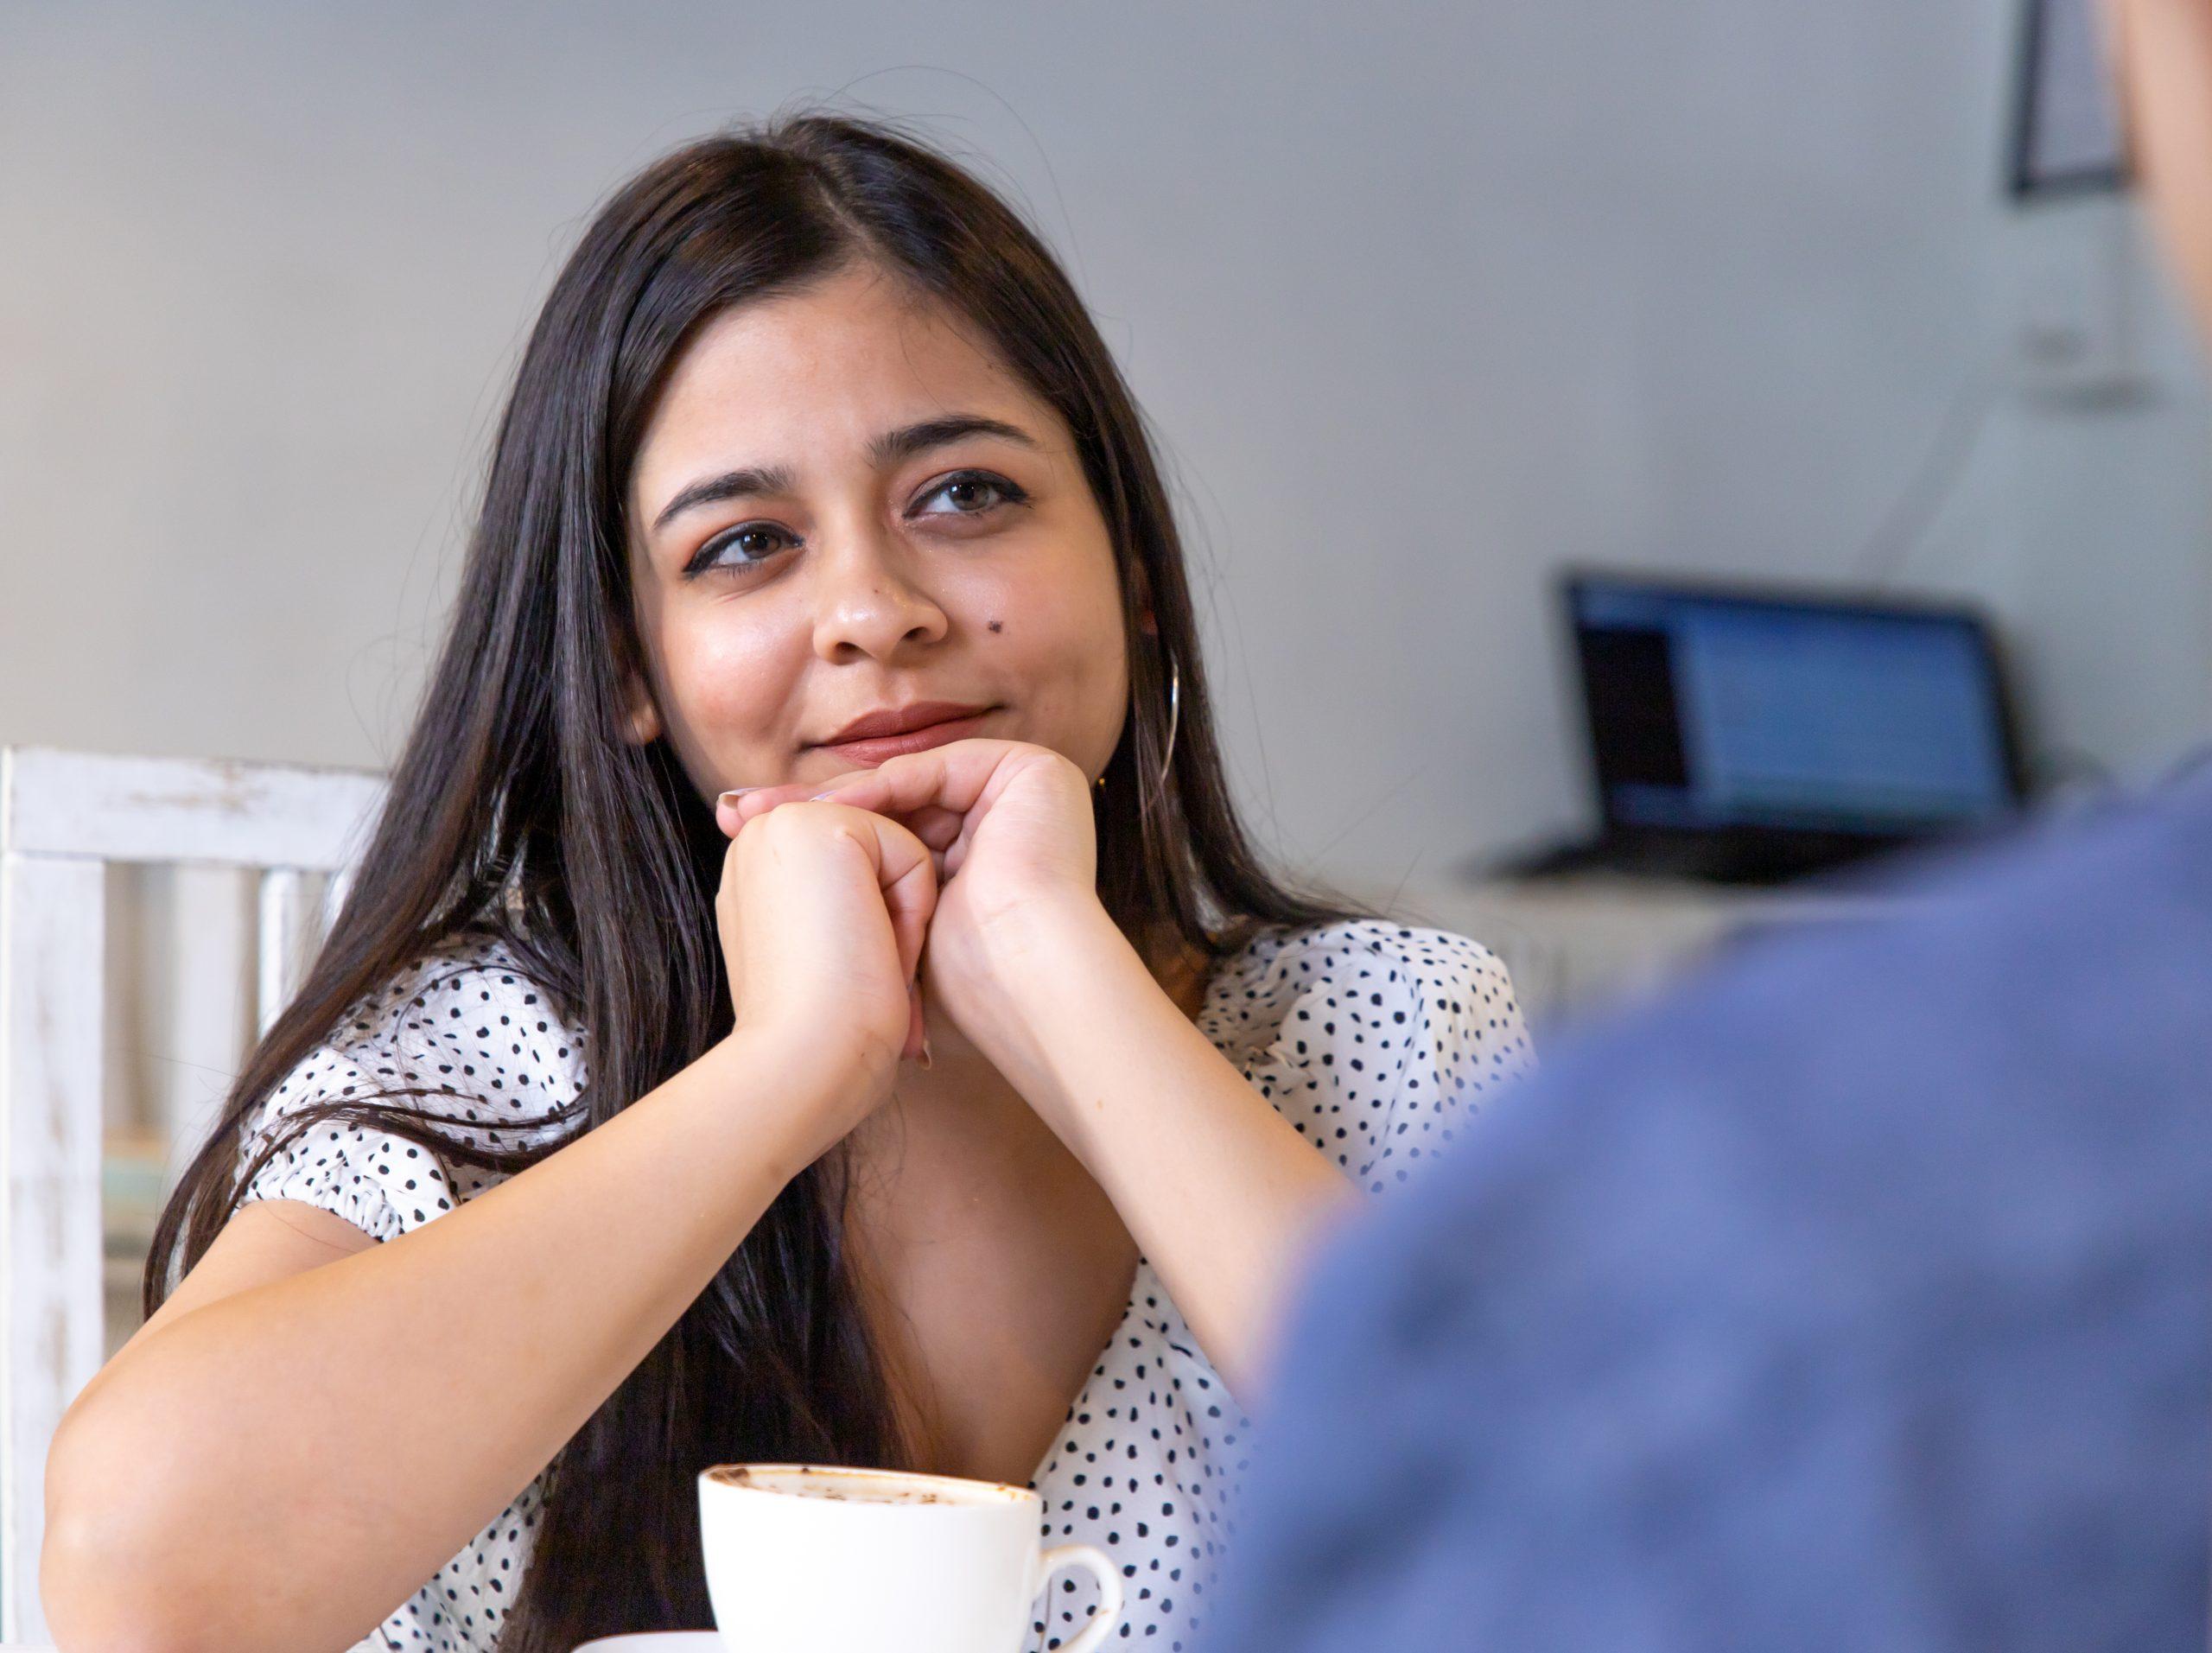 Girlfriend listening to boyfriend - Free Image by Akshay Gupta on PixaHive.com